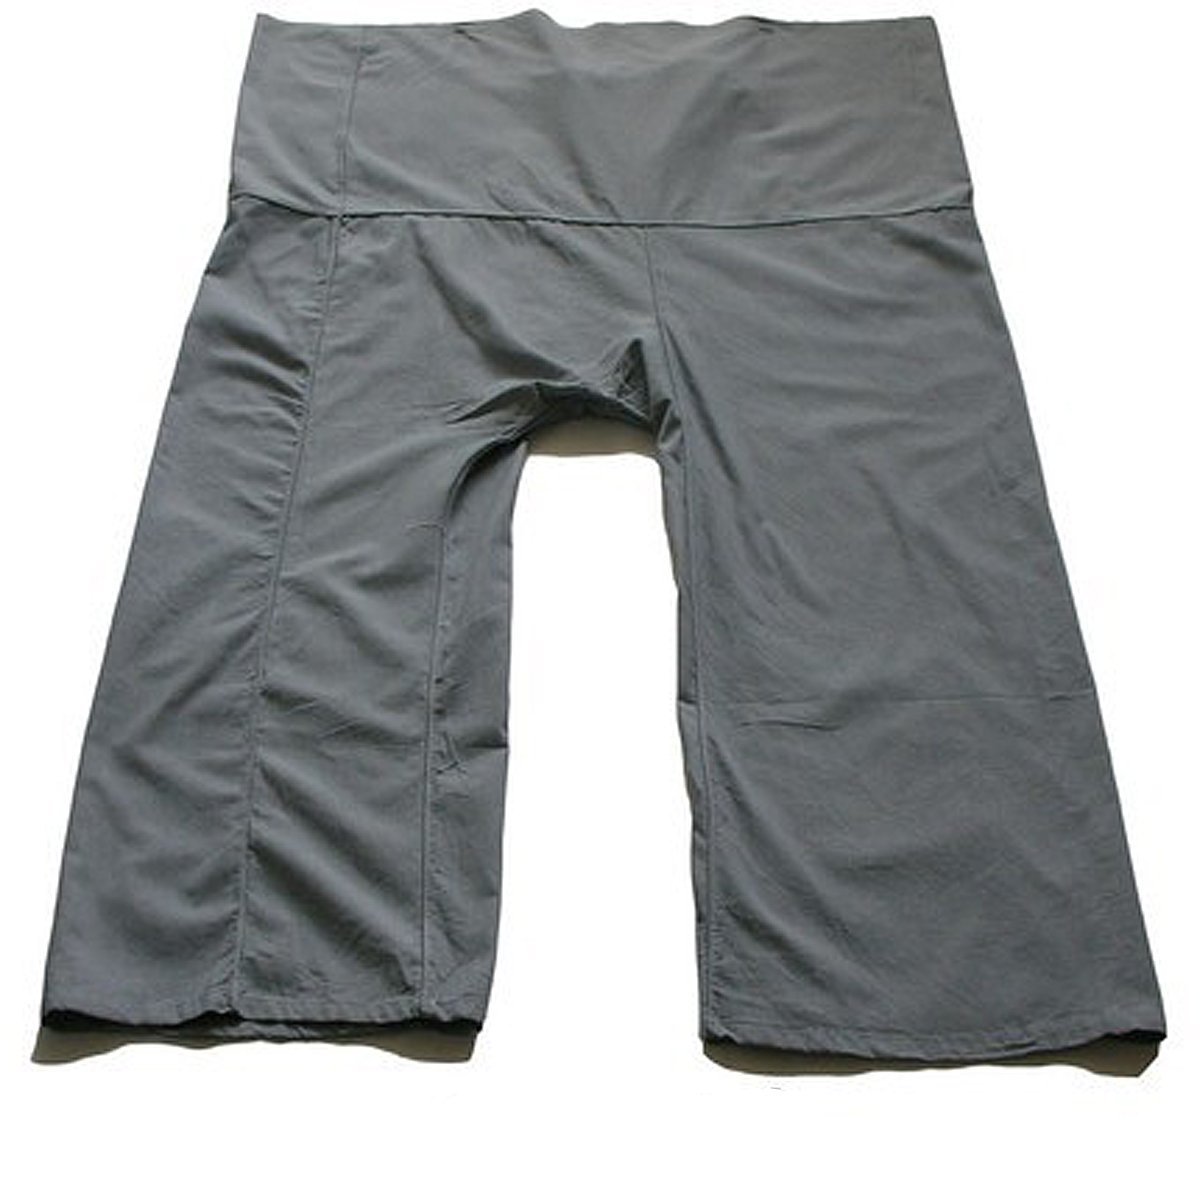 GREY Thai Fisherman Pants Yoga Trousers Free Size Toray Fabric (Light Cotton) Thai silk and cotton